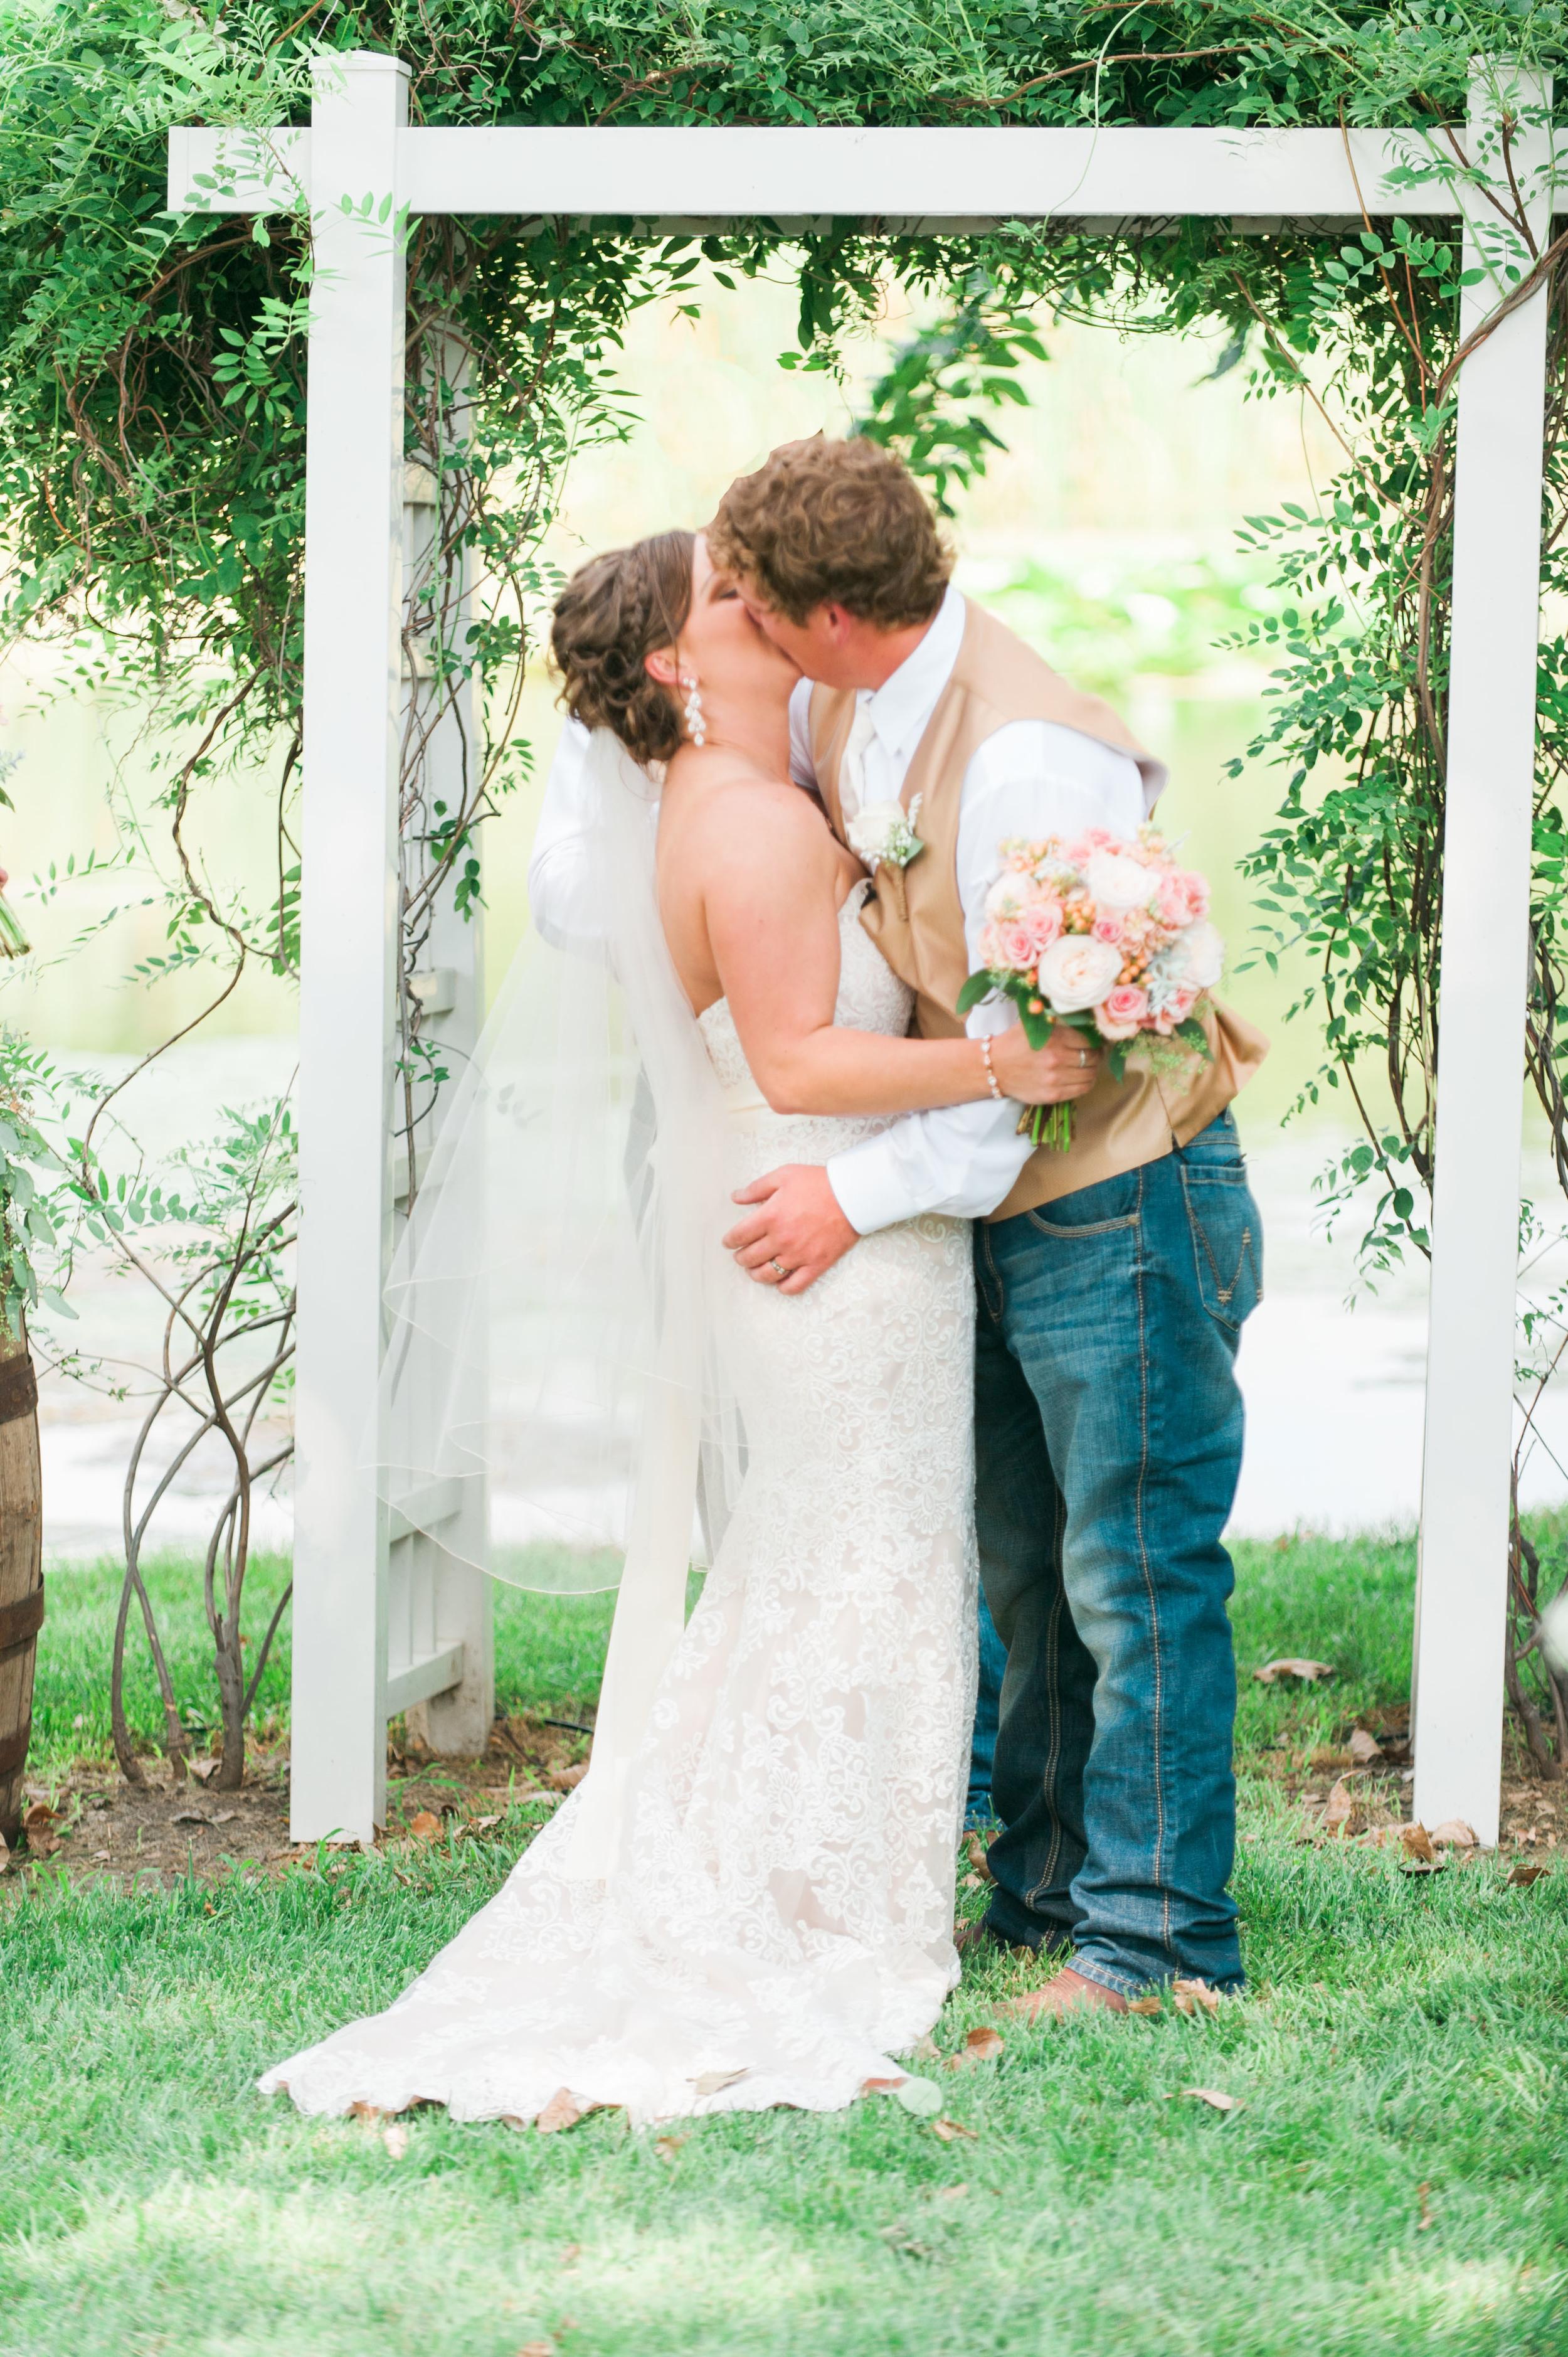 Omaha Nebraska wedding photography by Samantha Weddings